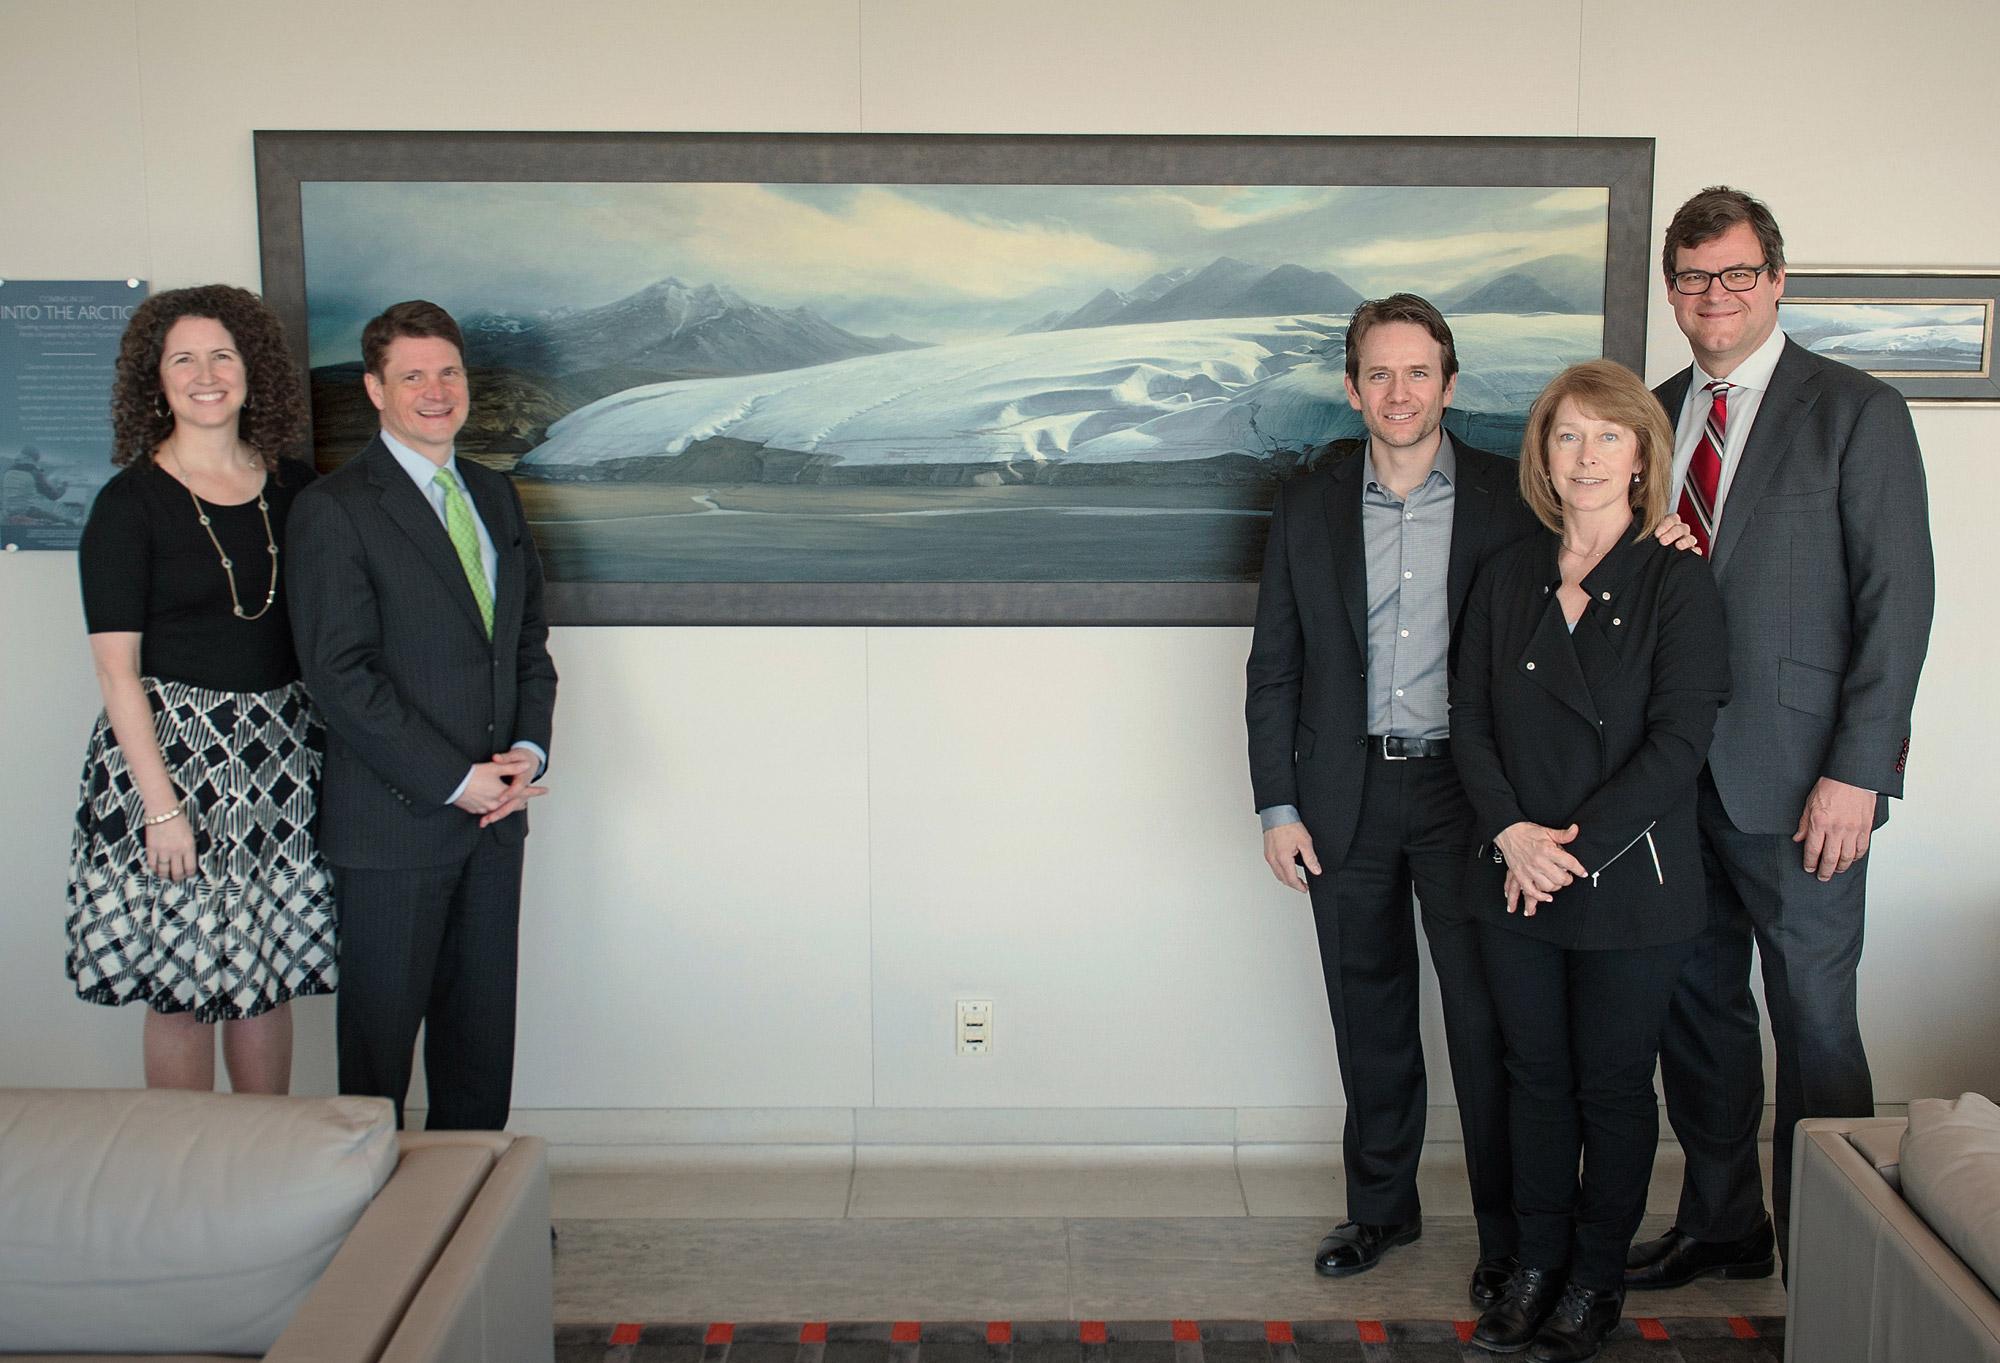 Trepanier,-Glacierside,-Embassy-of-Canada-in-Washington-DC-003-croppewd